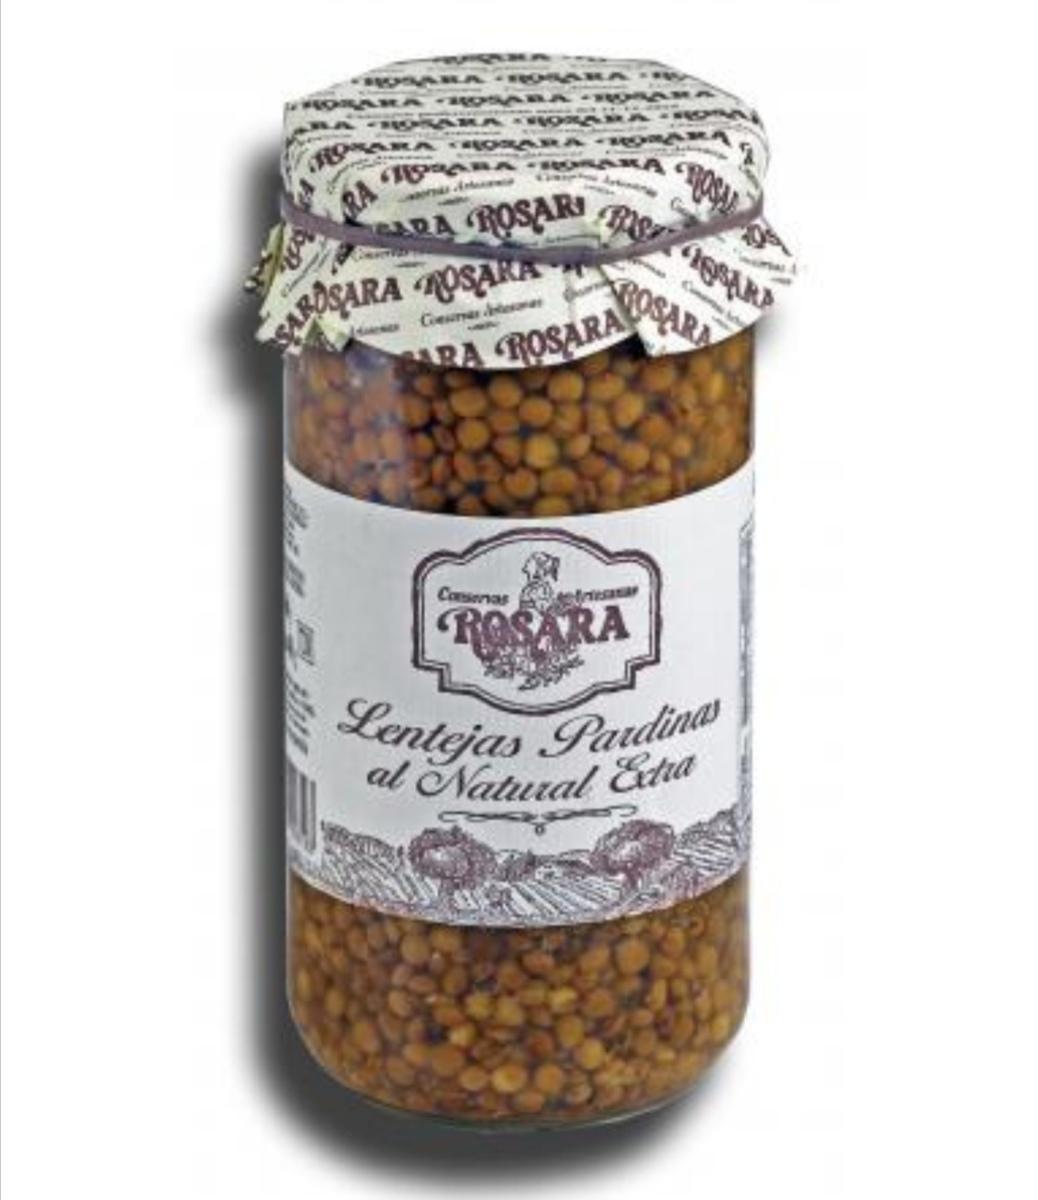 Lentejas Pardinas en conserva - Rosara - 1 kg